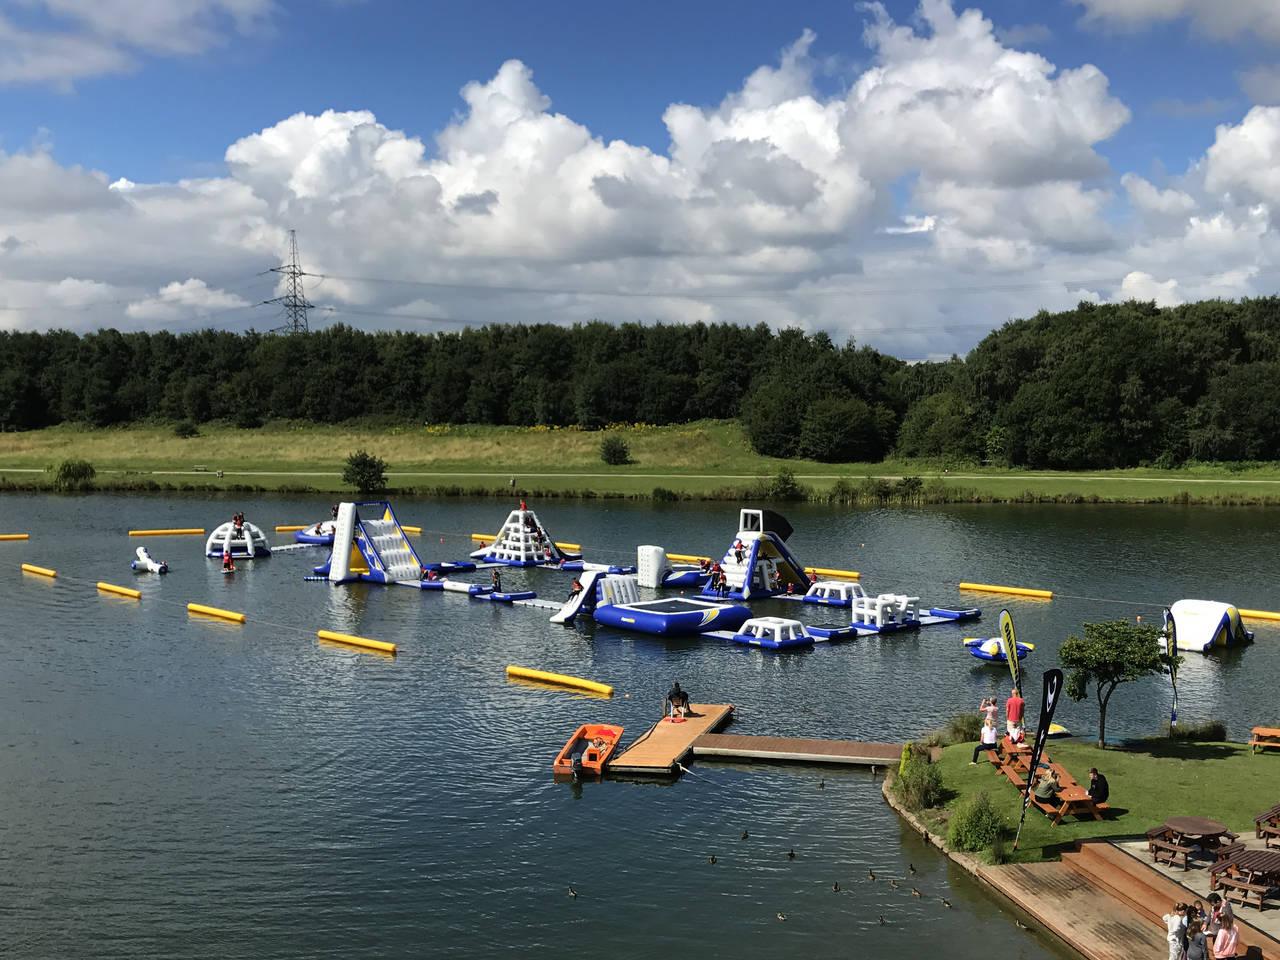 Inflatable Obstacle fun at Sheffield Aqua Park